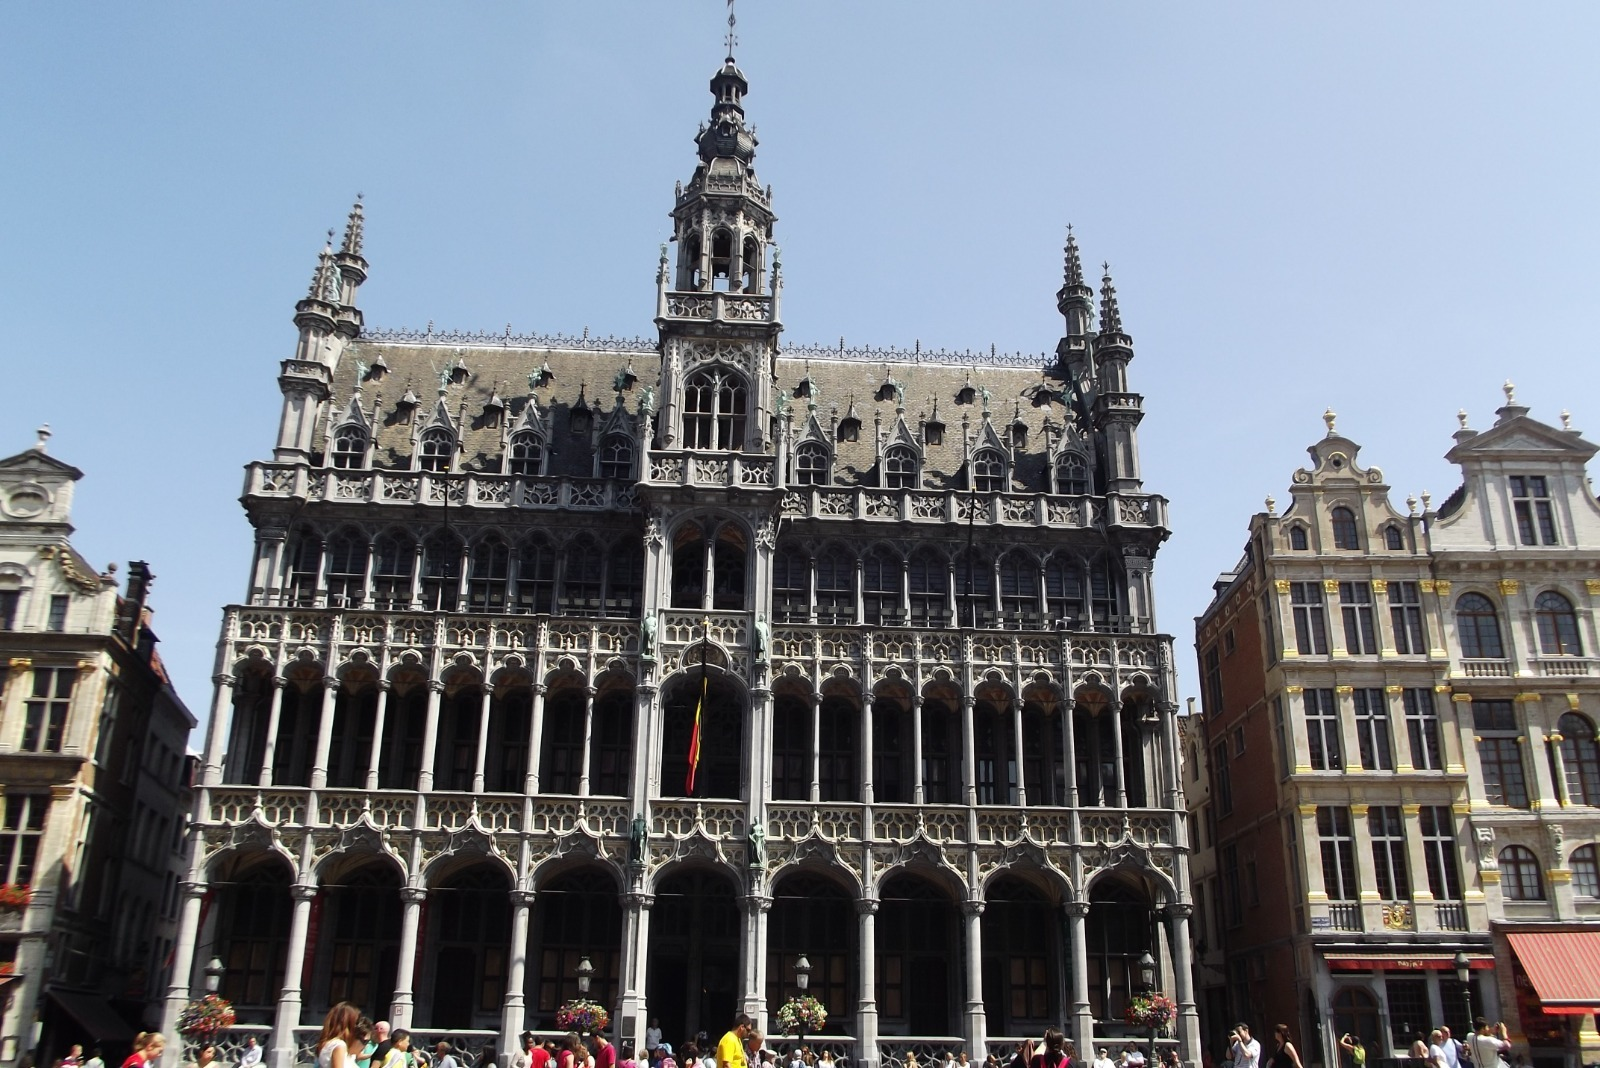 belgioelussemburgo12-1600418715.jpg